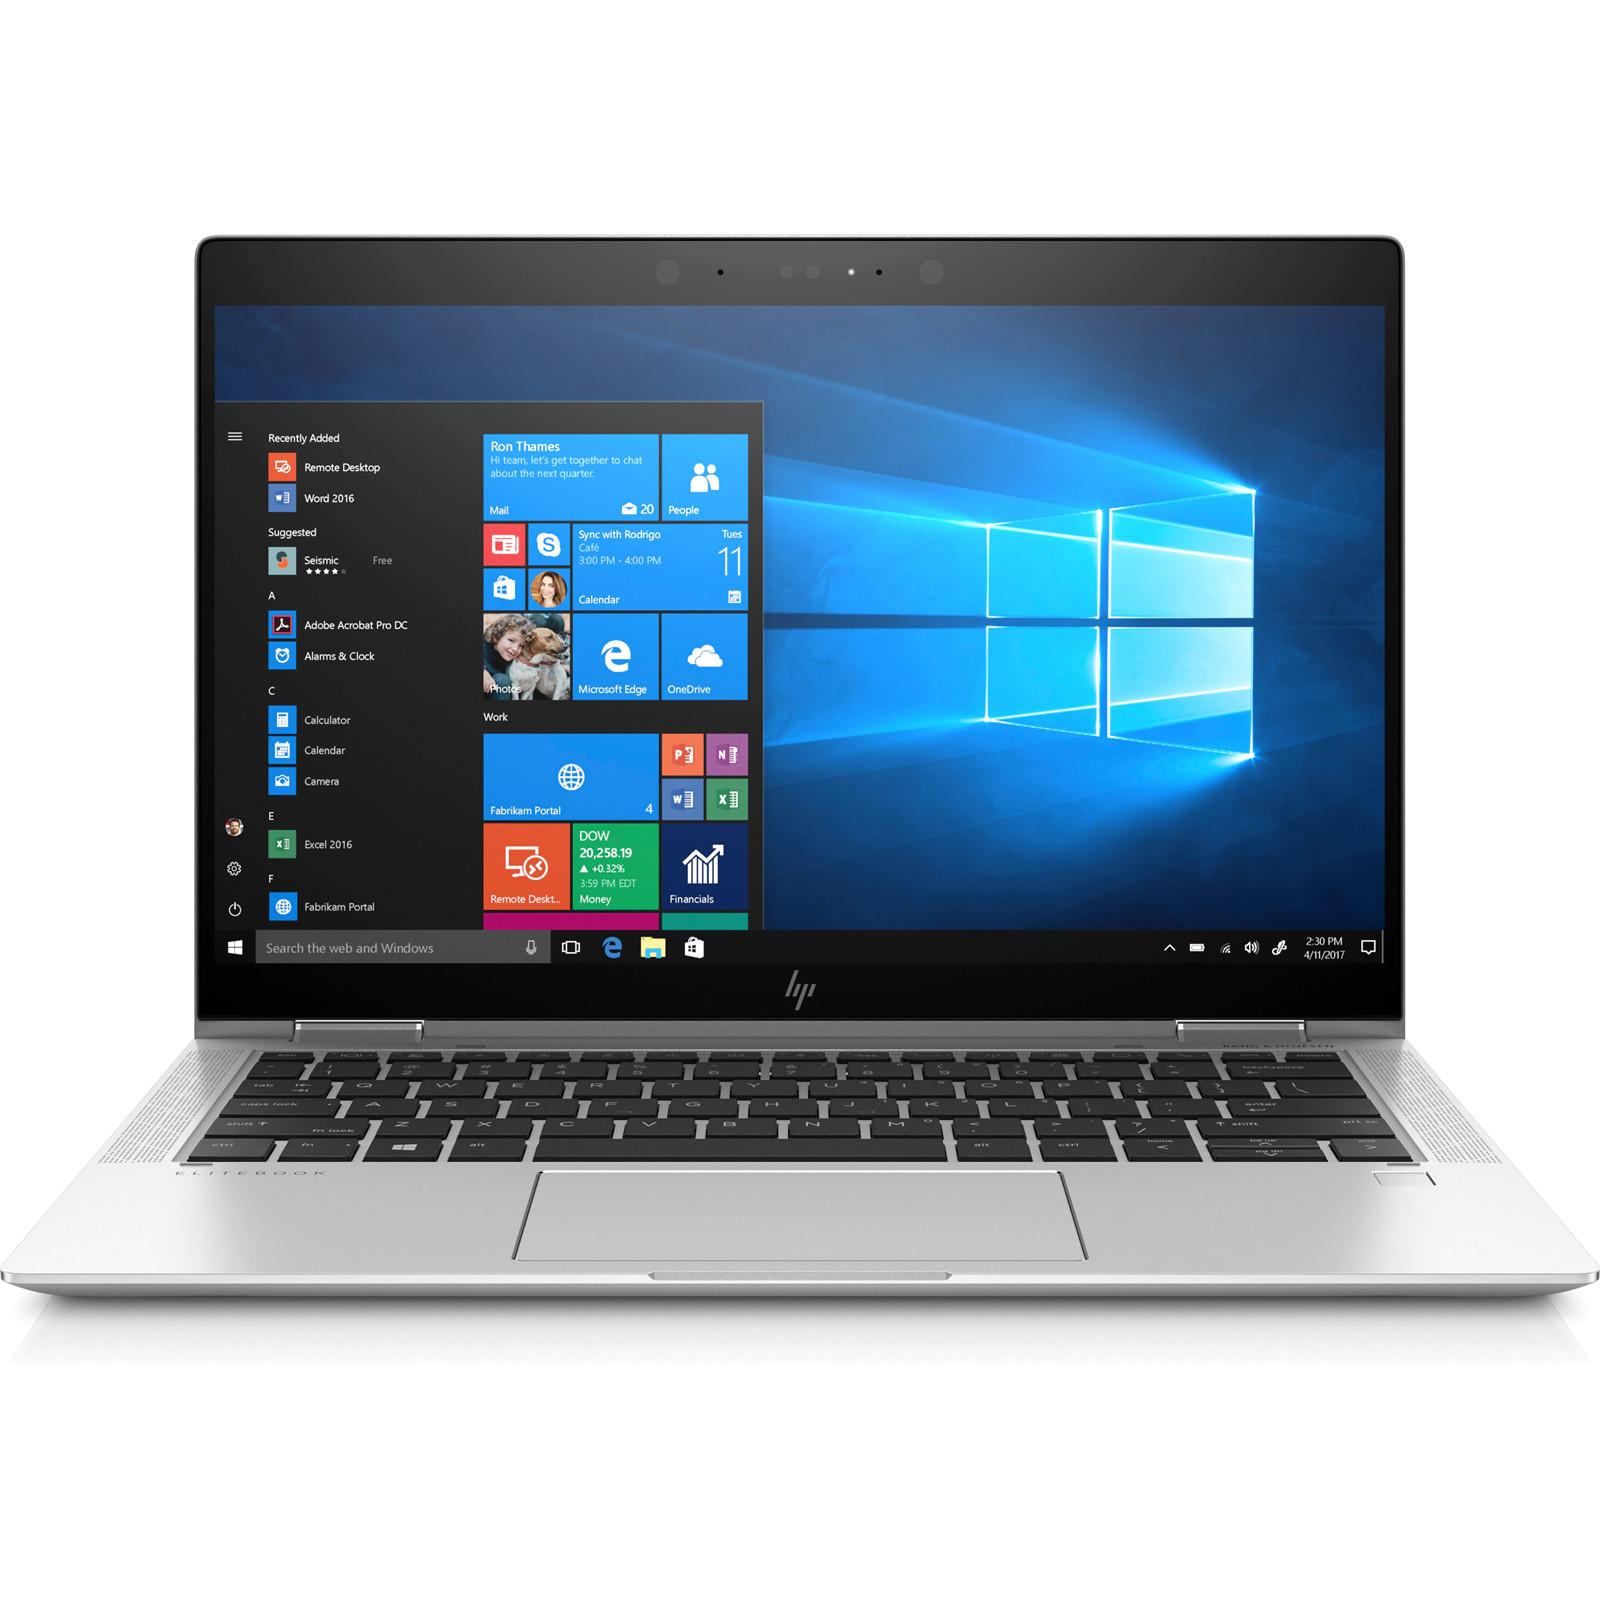 "HP EliteBook x360 1030 G3 Business Ultrabook 13 3"" FHD Anti Glare Touchscreen Intel i7 8650U 8GB DDR4 256GB 4G LTE NVME SSD Win10Pro 64bit 3yr warranty"